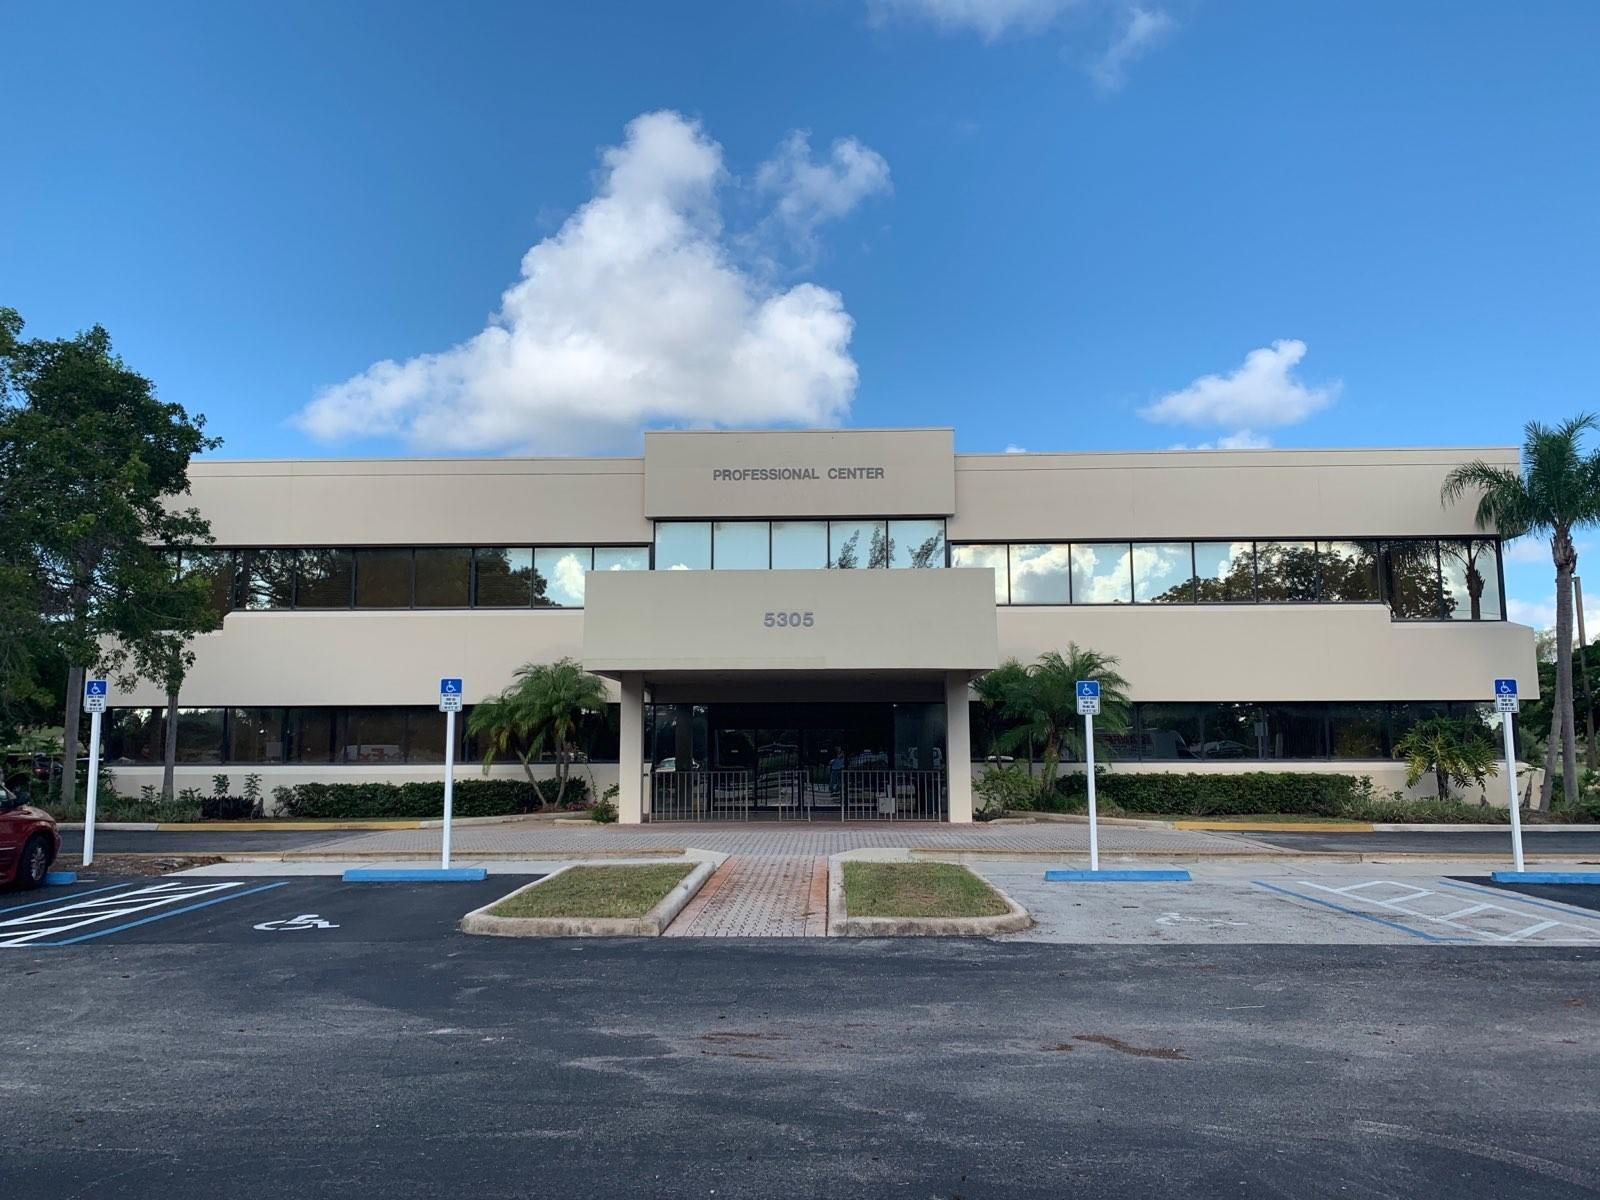 5305 Greenwood, West Palm Beach, Florida 33407